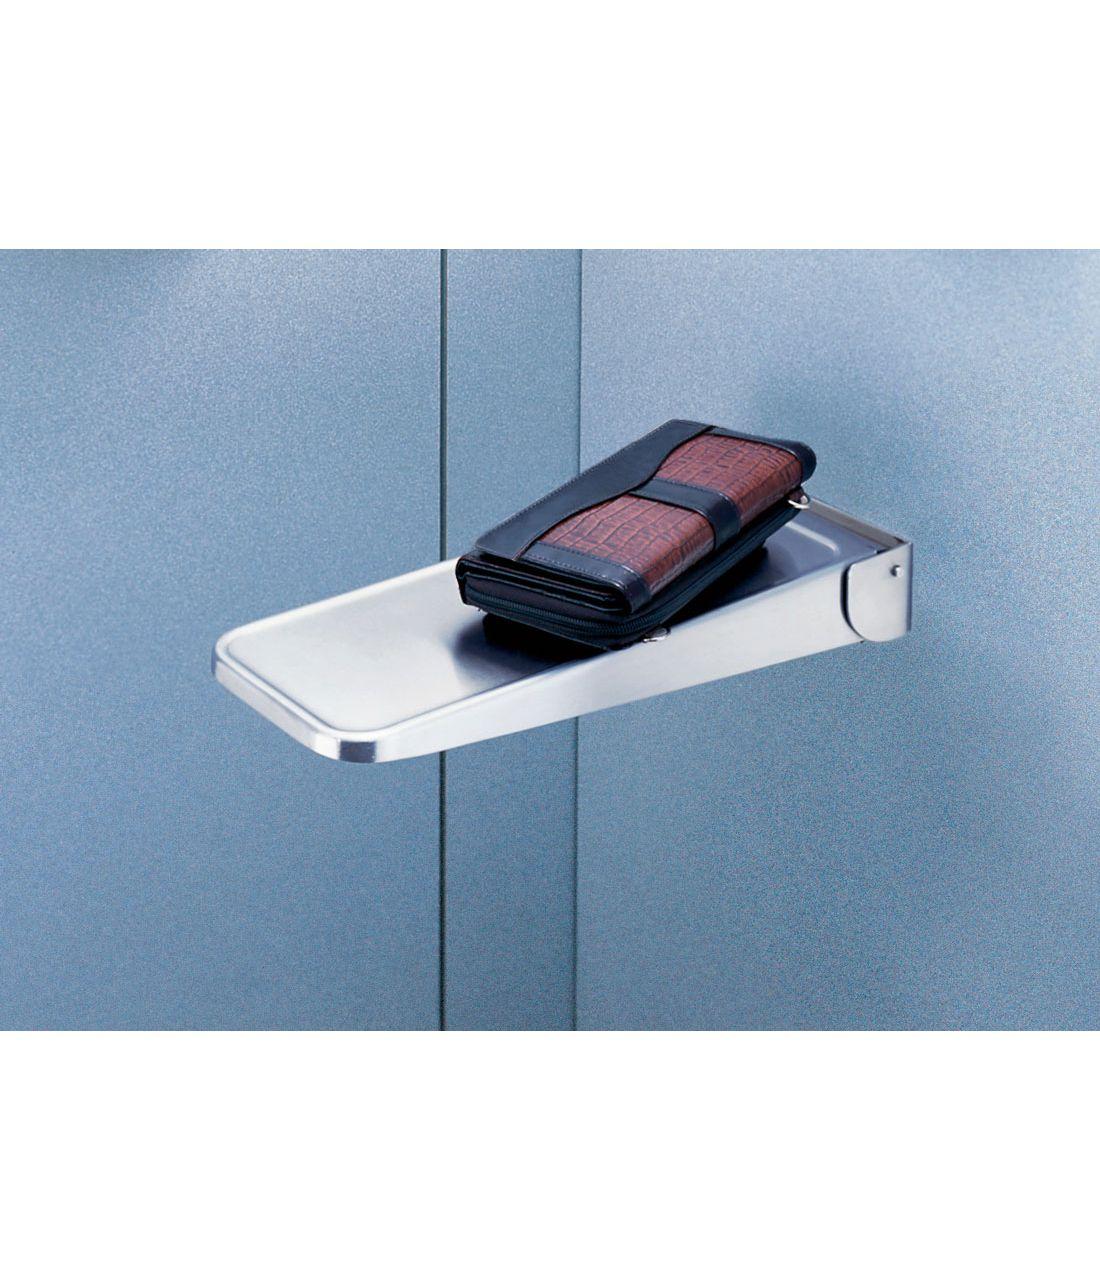 phone shelves for public restrooms - Google Search | Phone shelves ...